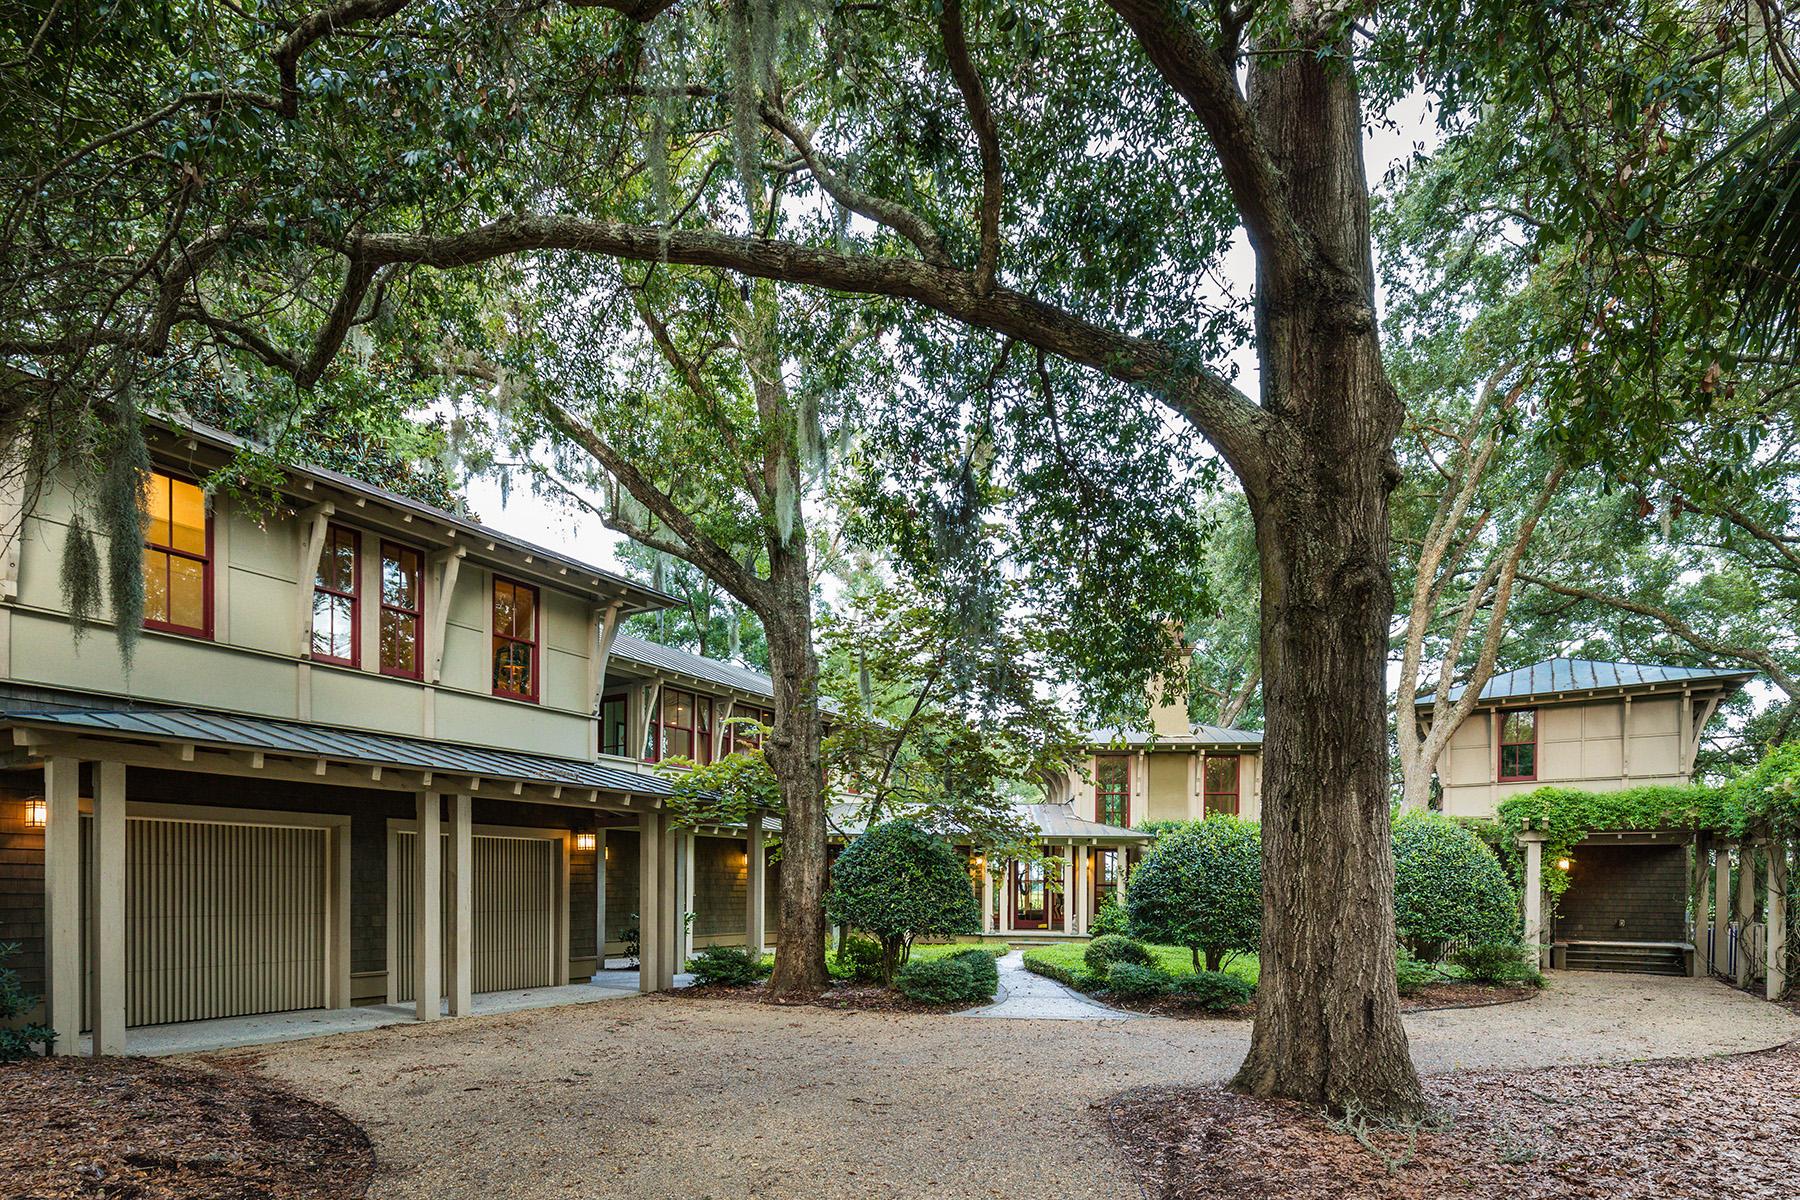 Ellis Oaks Homes For Sale - 672 Ellis Oak, Charleston, SC - 3